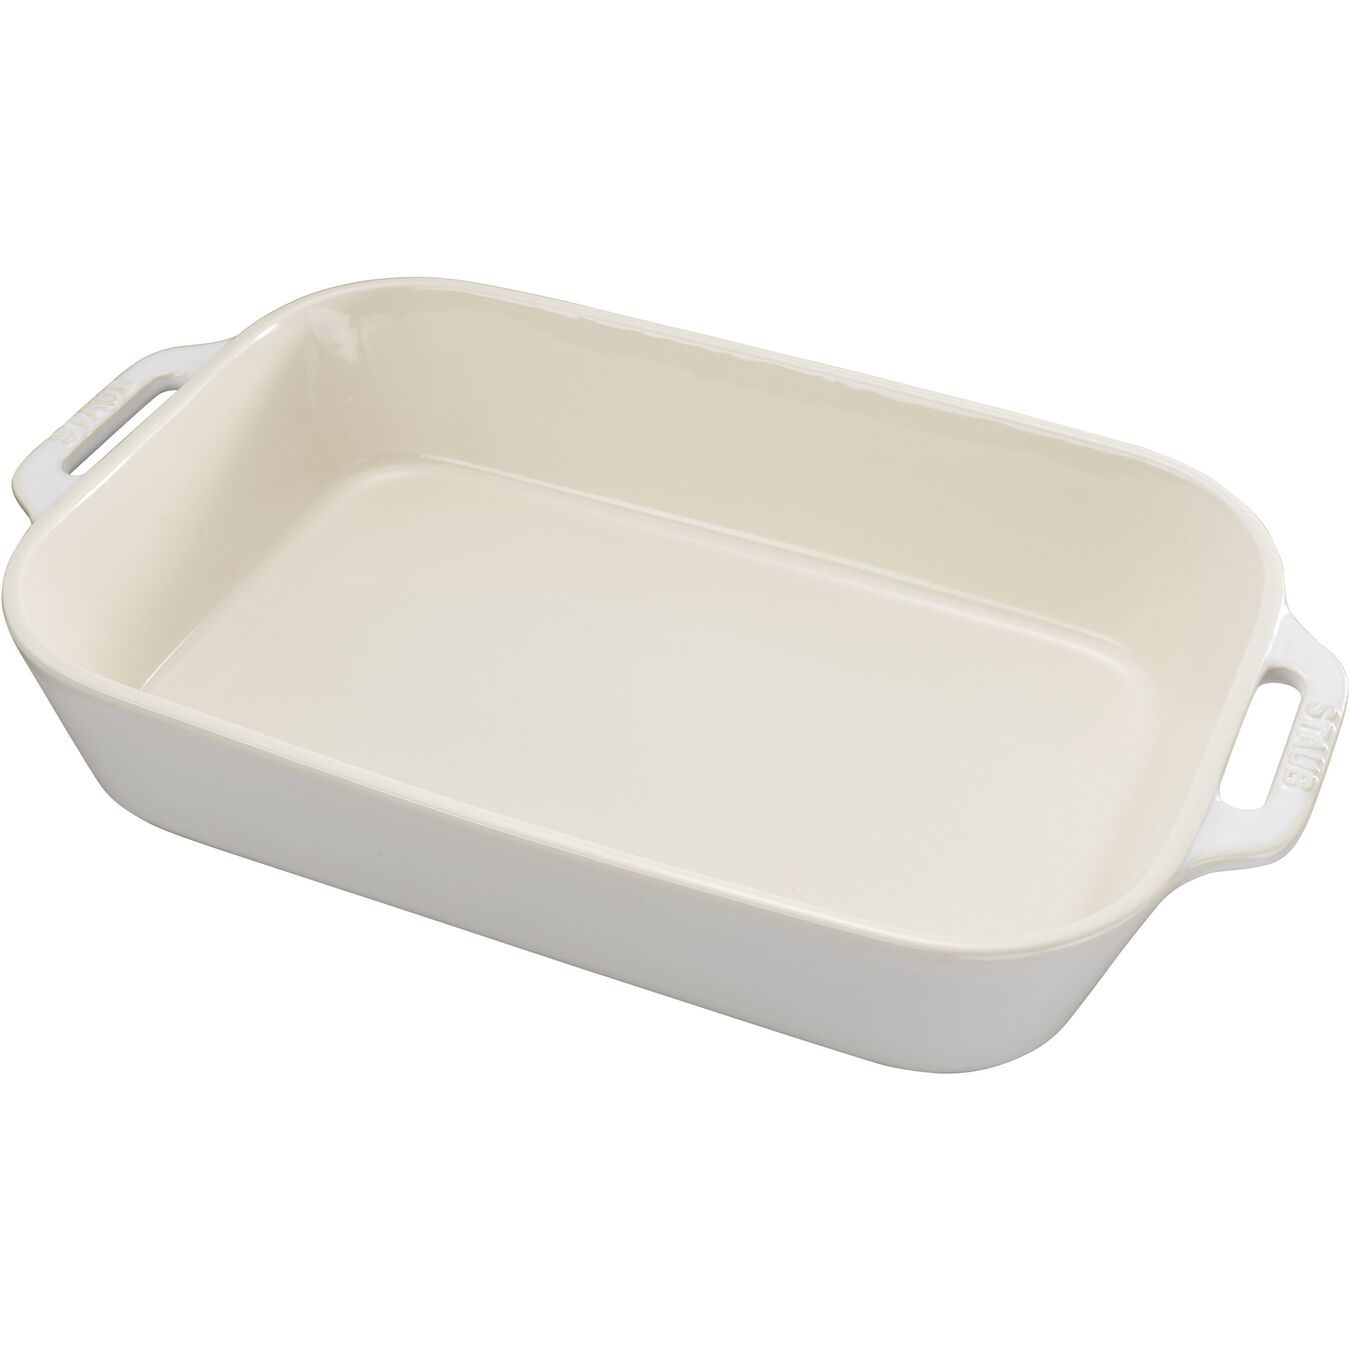 9.5-inch, rectangular, Oven dish, ivory-white,,large 1